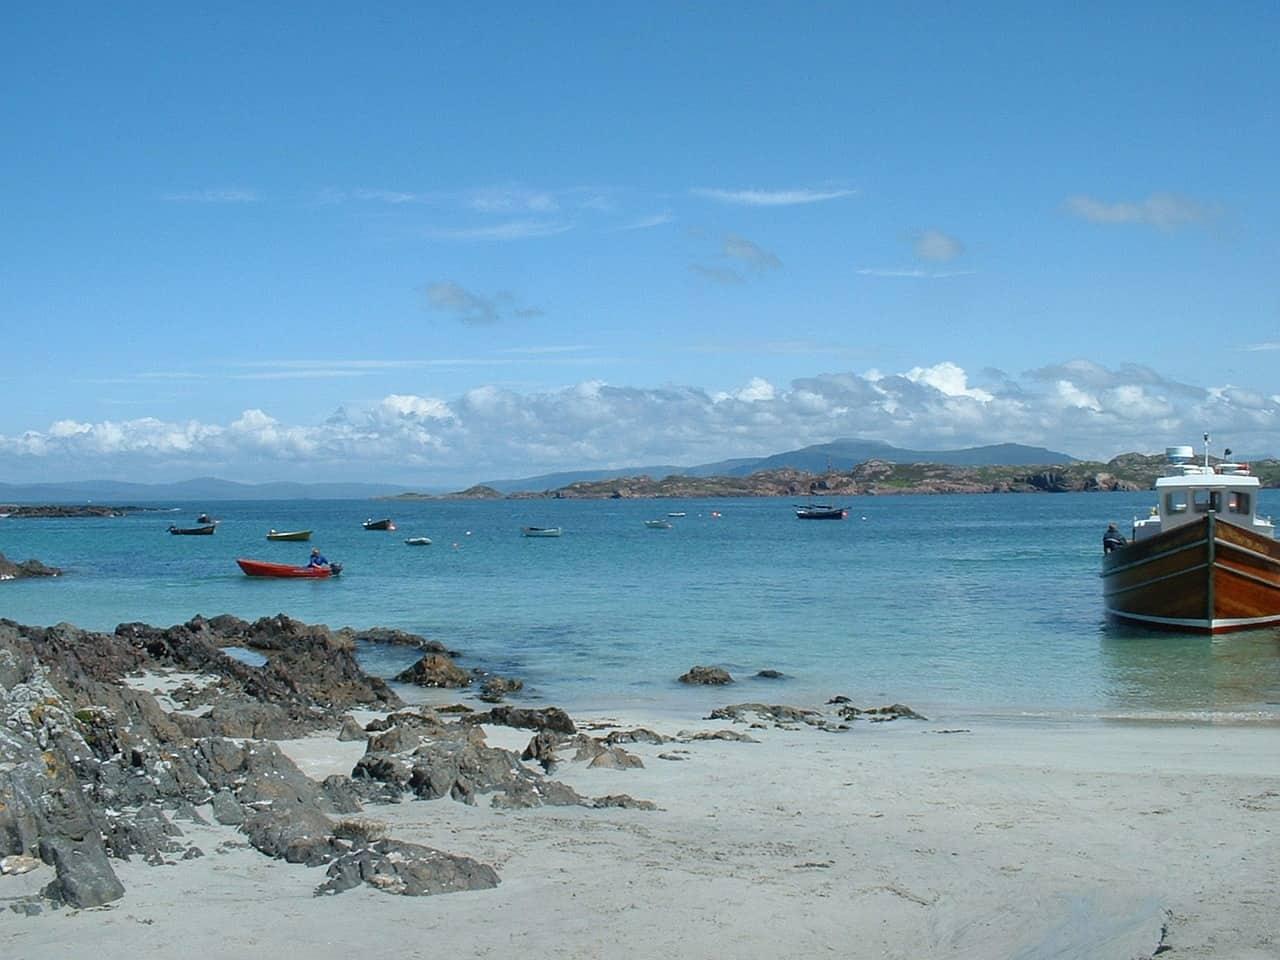 A beach in Iona